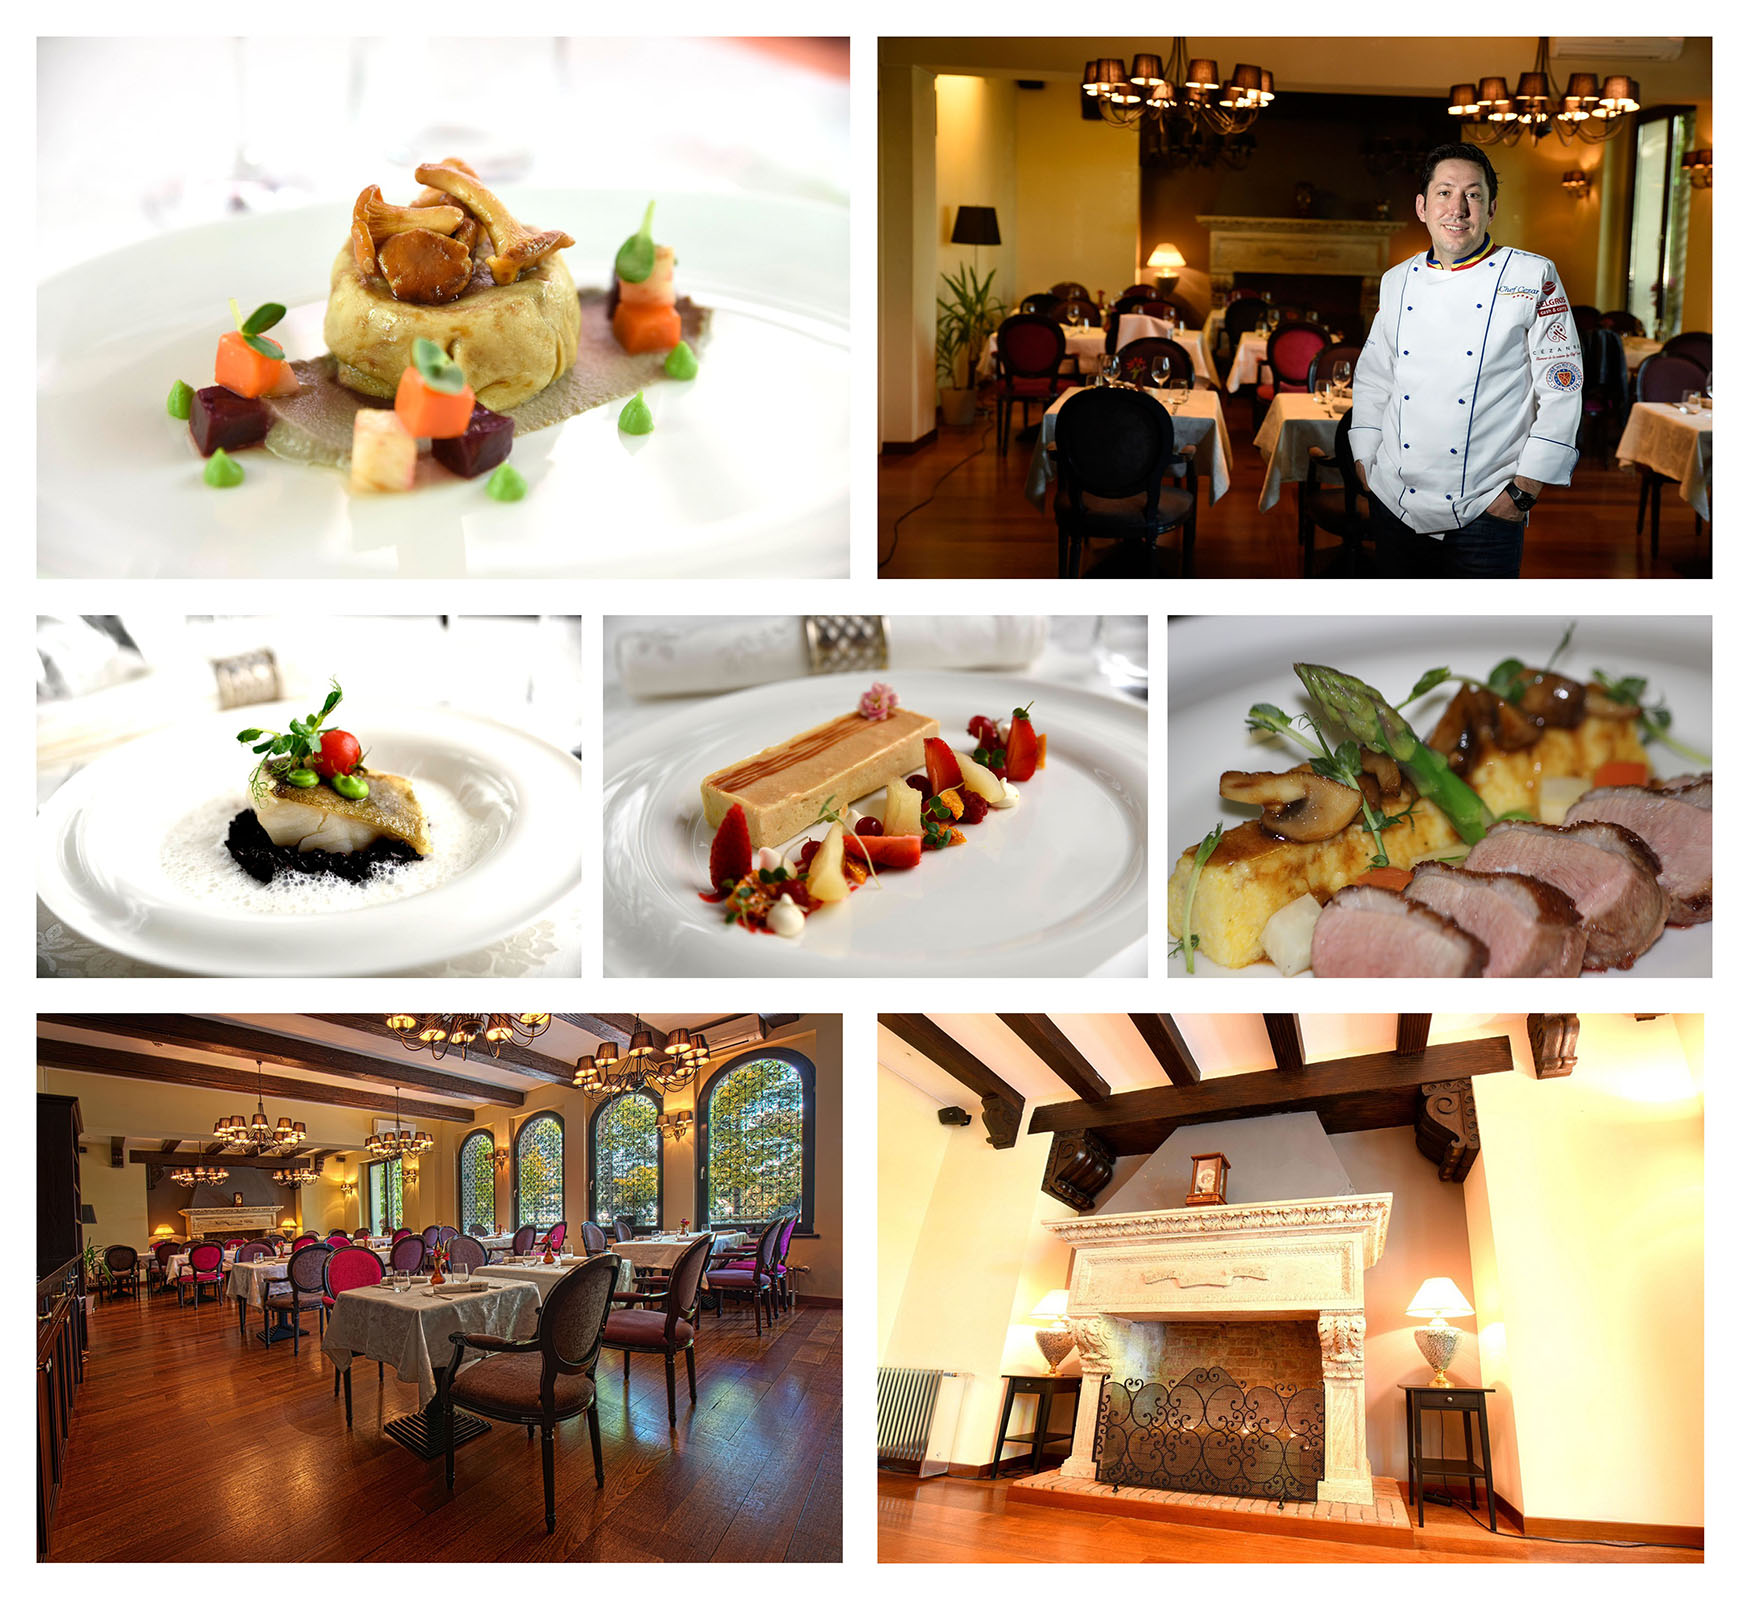 Restaurant Cézanne – glamour de la cuisine by Cezar Munteanu